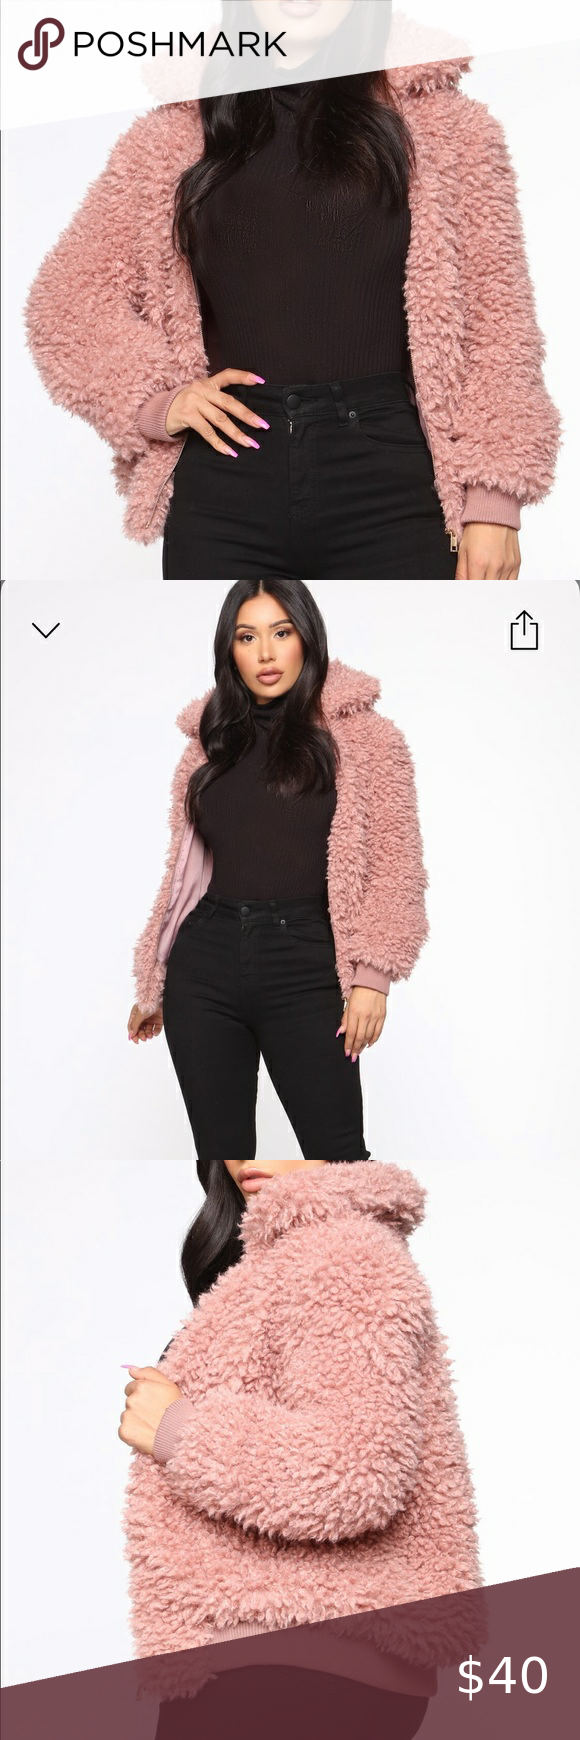 Fashion Nova Fuzzy Bomber Jacket Bomber Jacket Fashion Fashion Fashion Nova [ 1740 x 580 Pixel ]